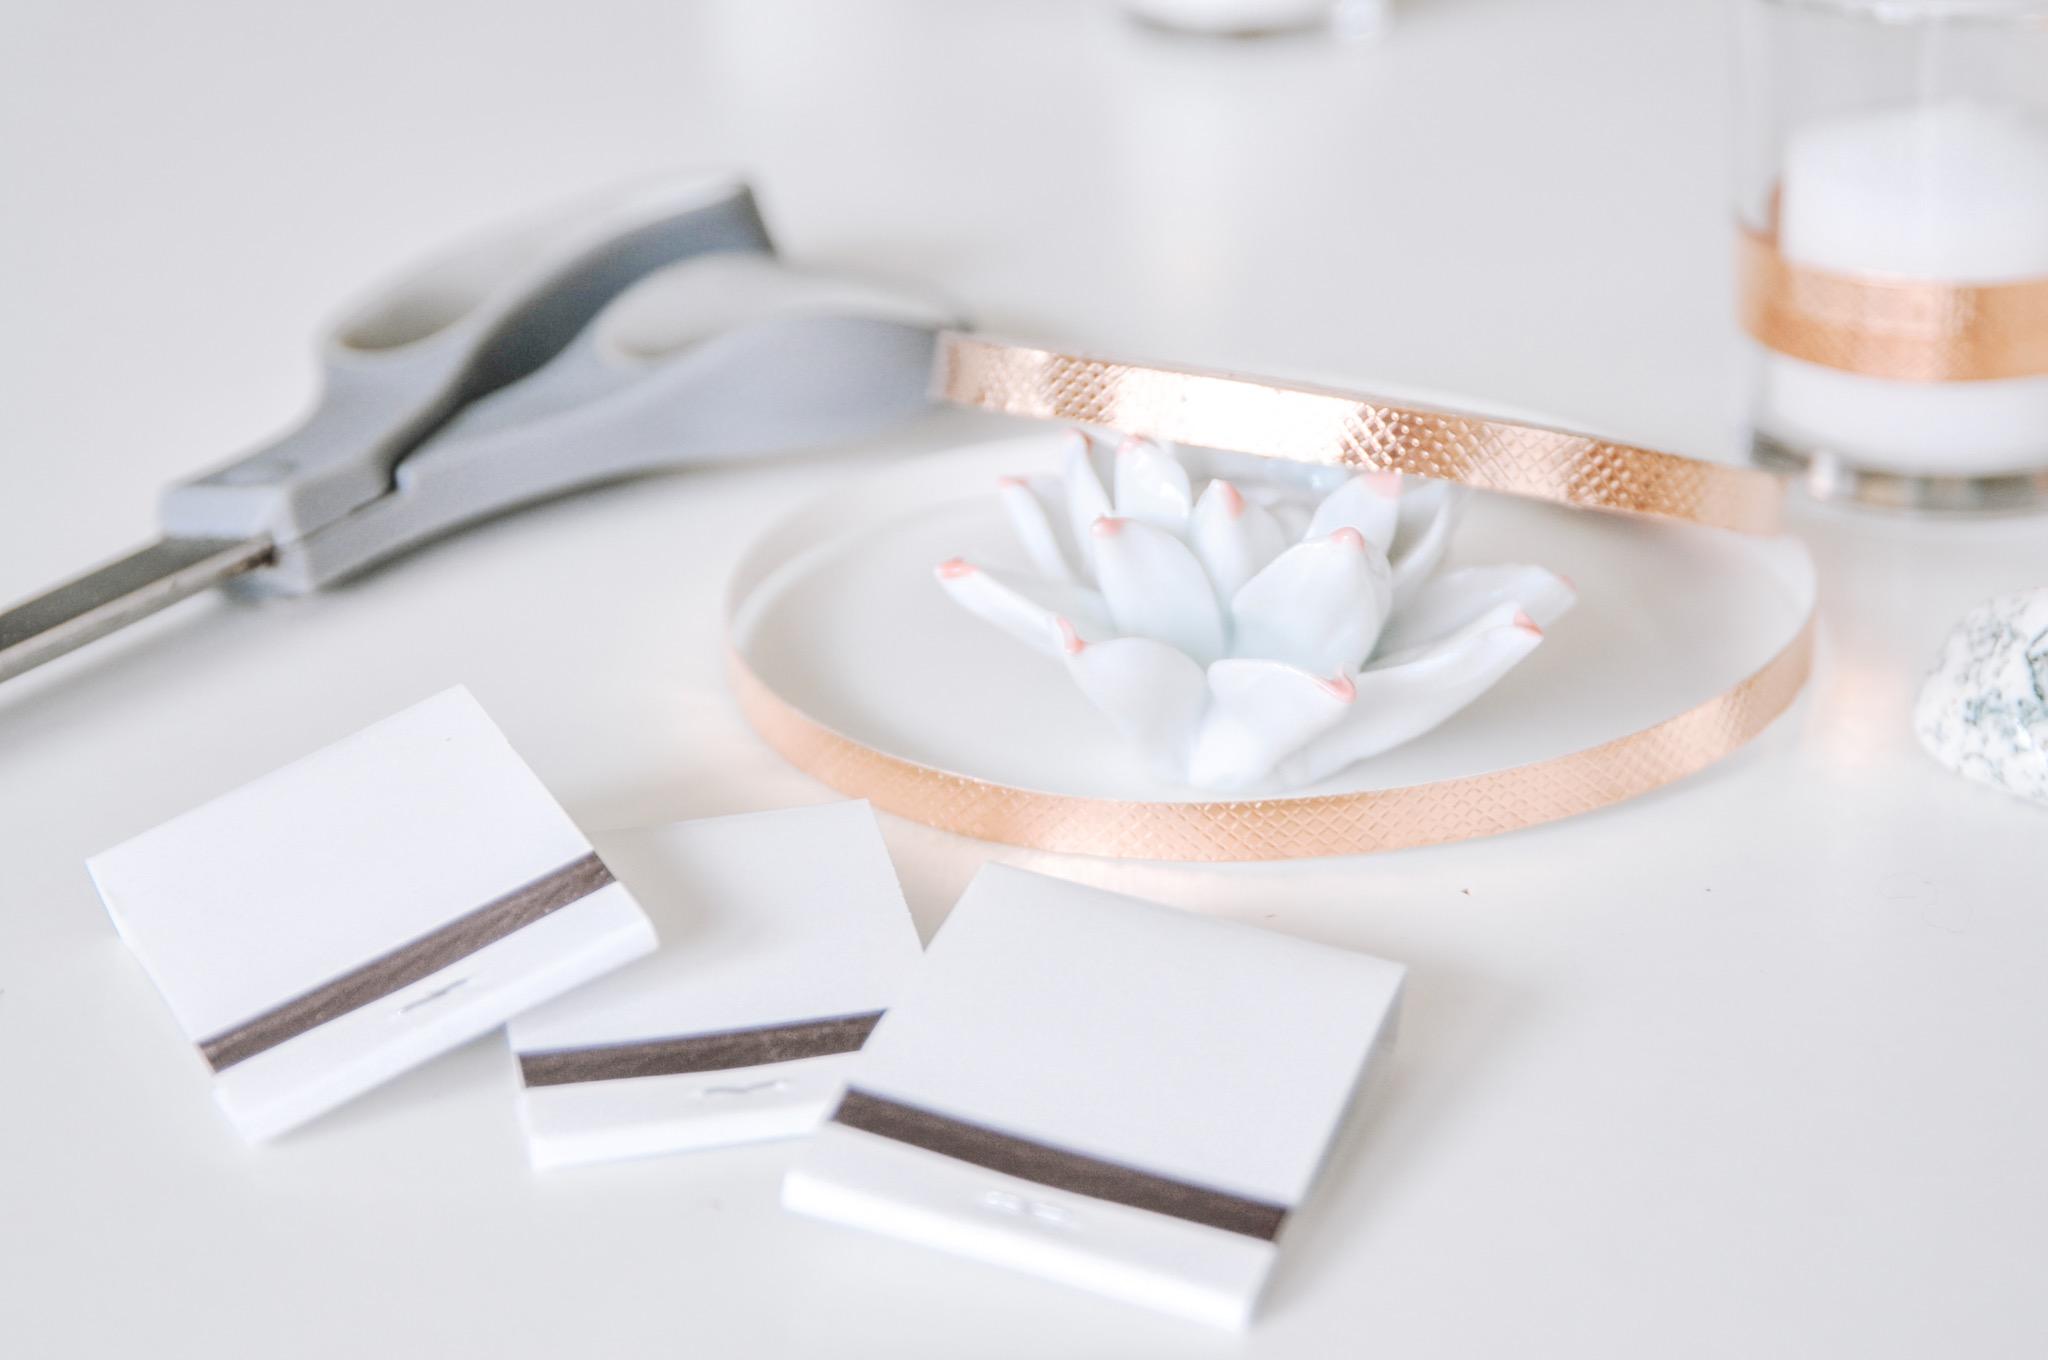 supplies to diy matchbooks pop shop america craft tutorial